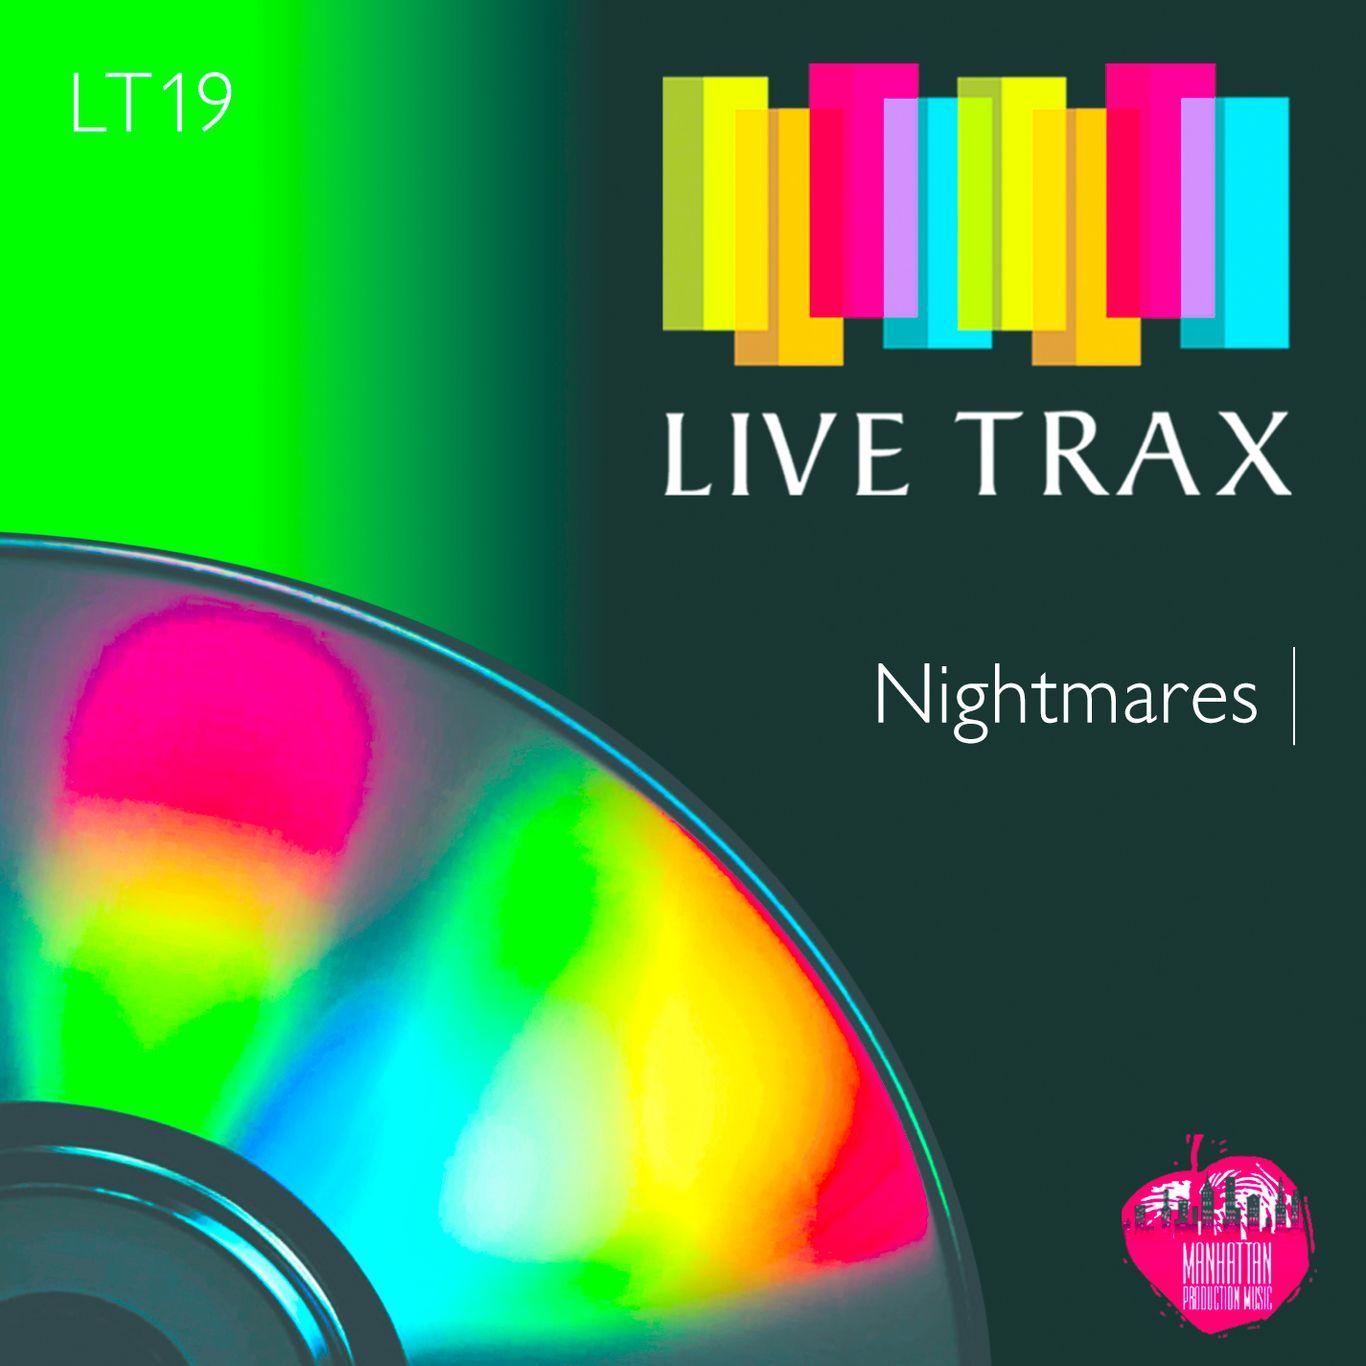 Popular tracks to sample in D flat major | Tracklib